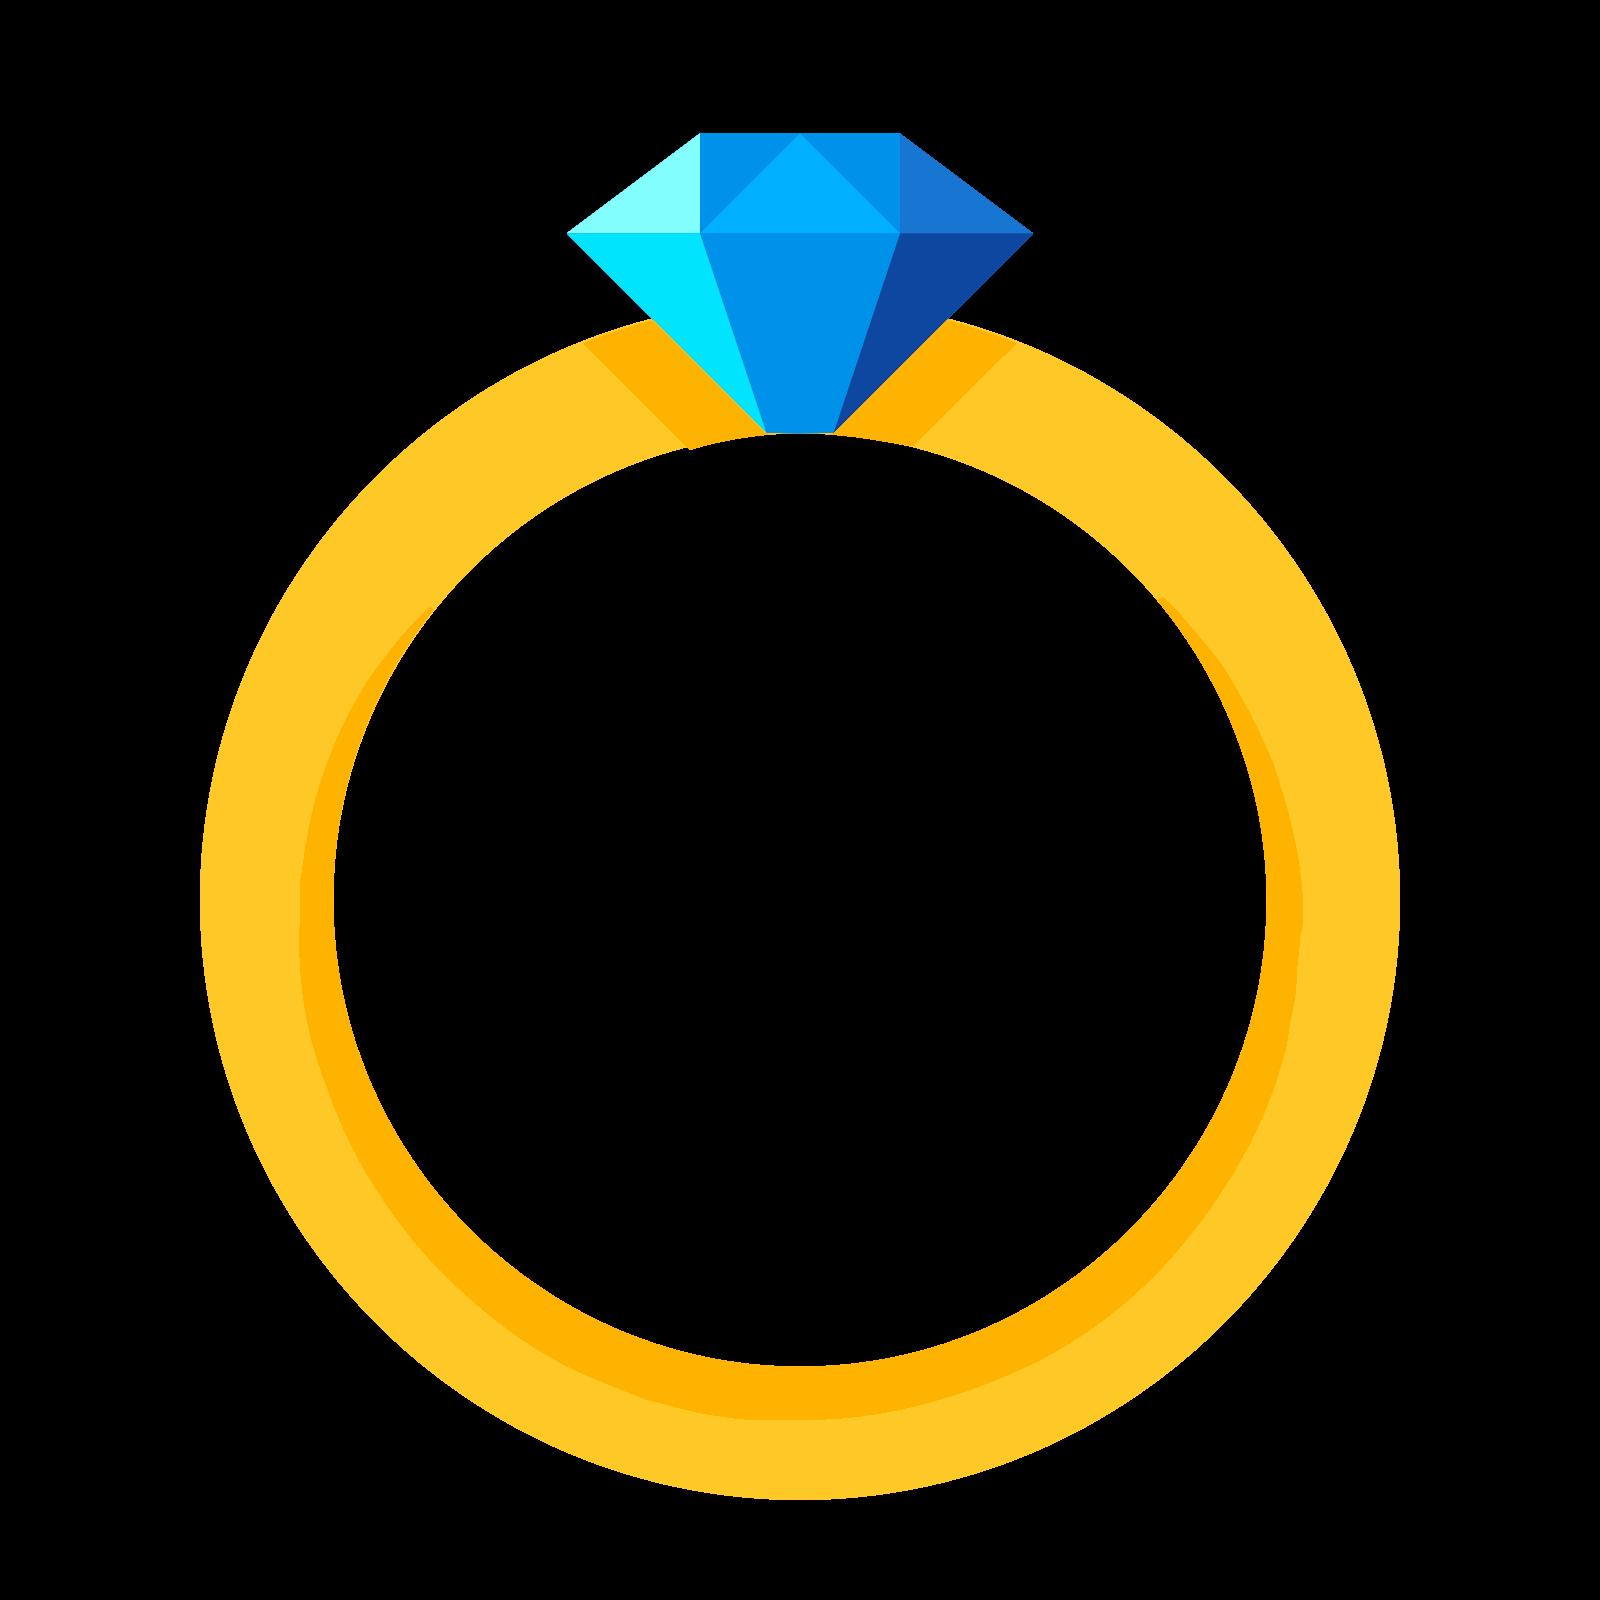 vector freeuse download Vector color ring. Diamantring icon free download